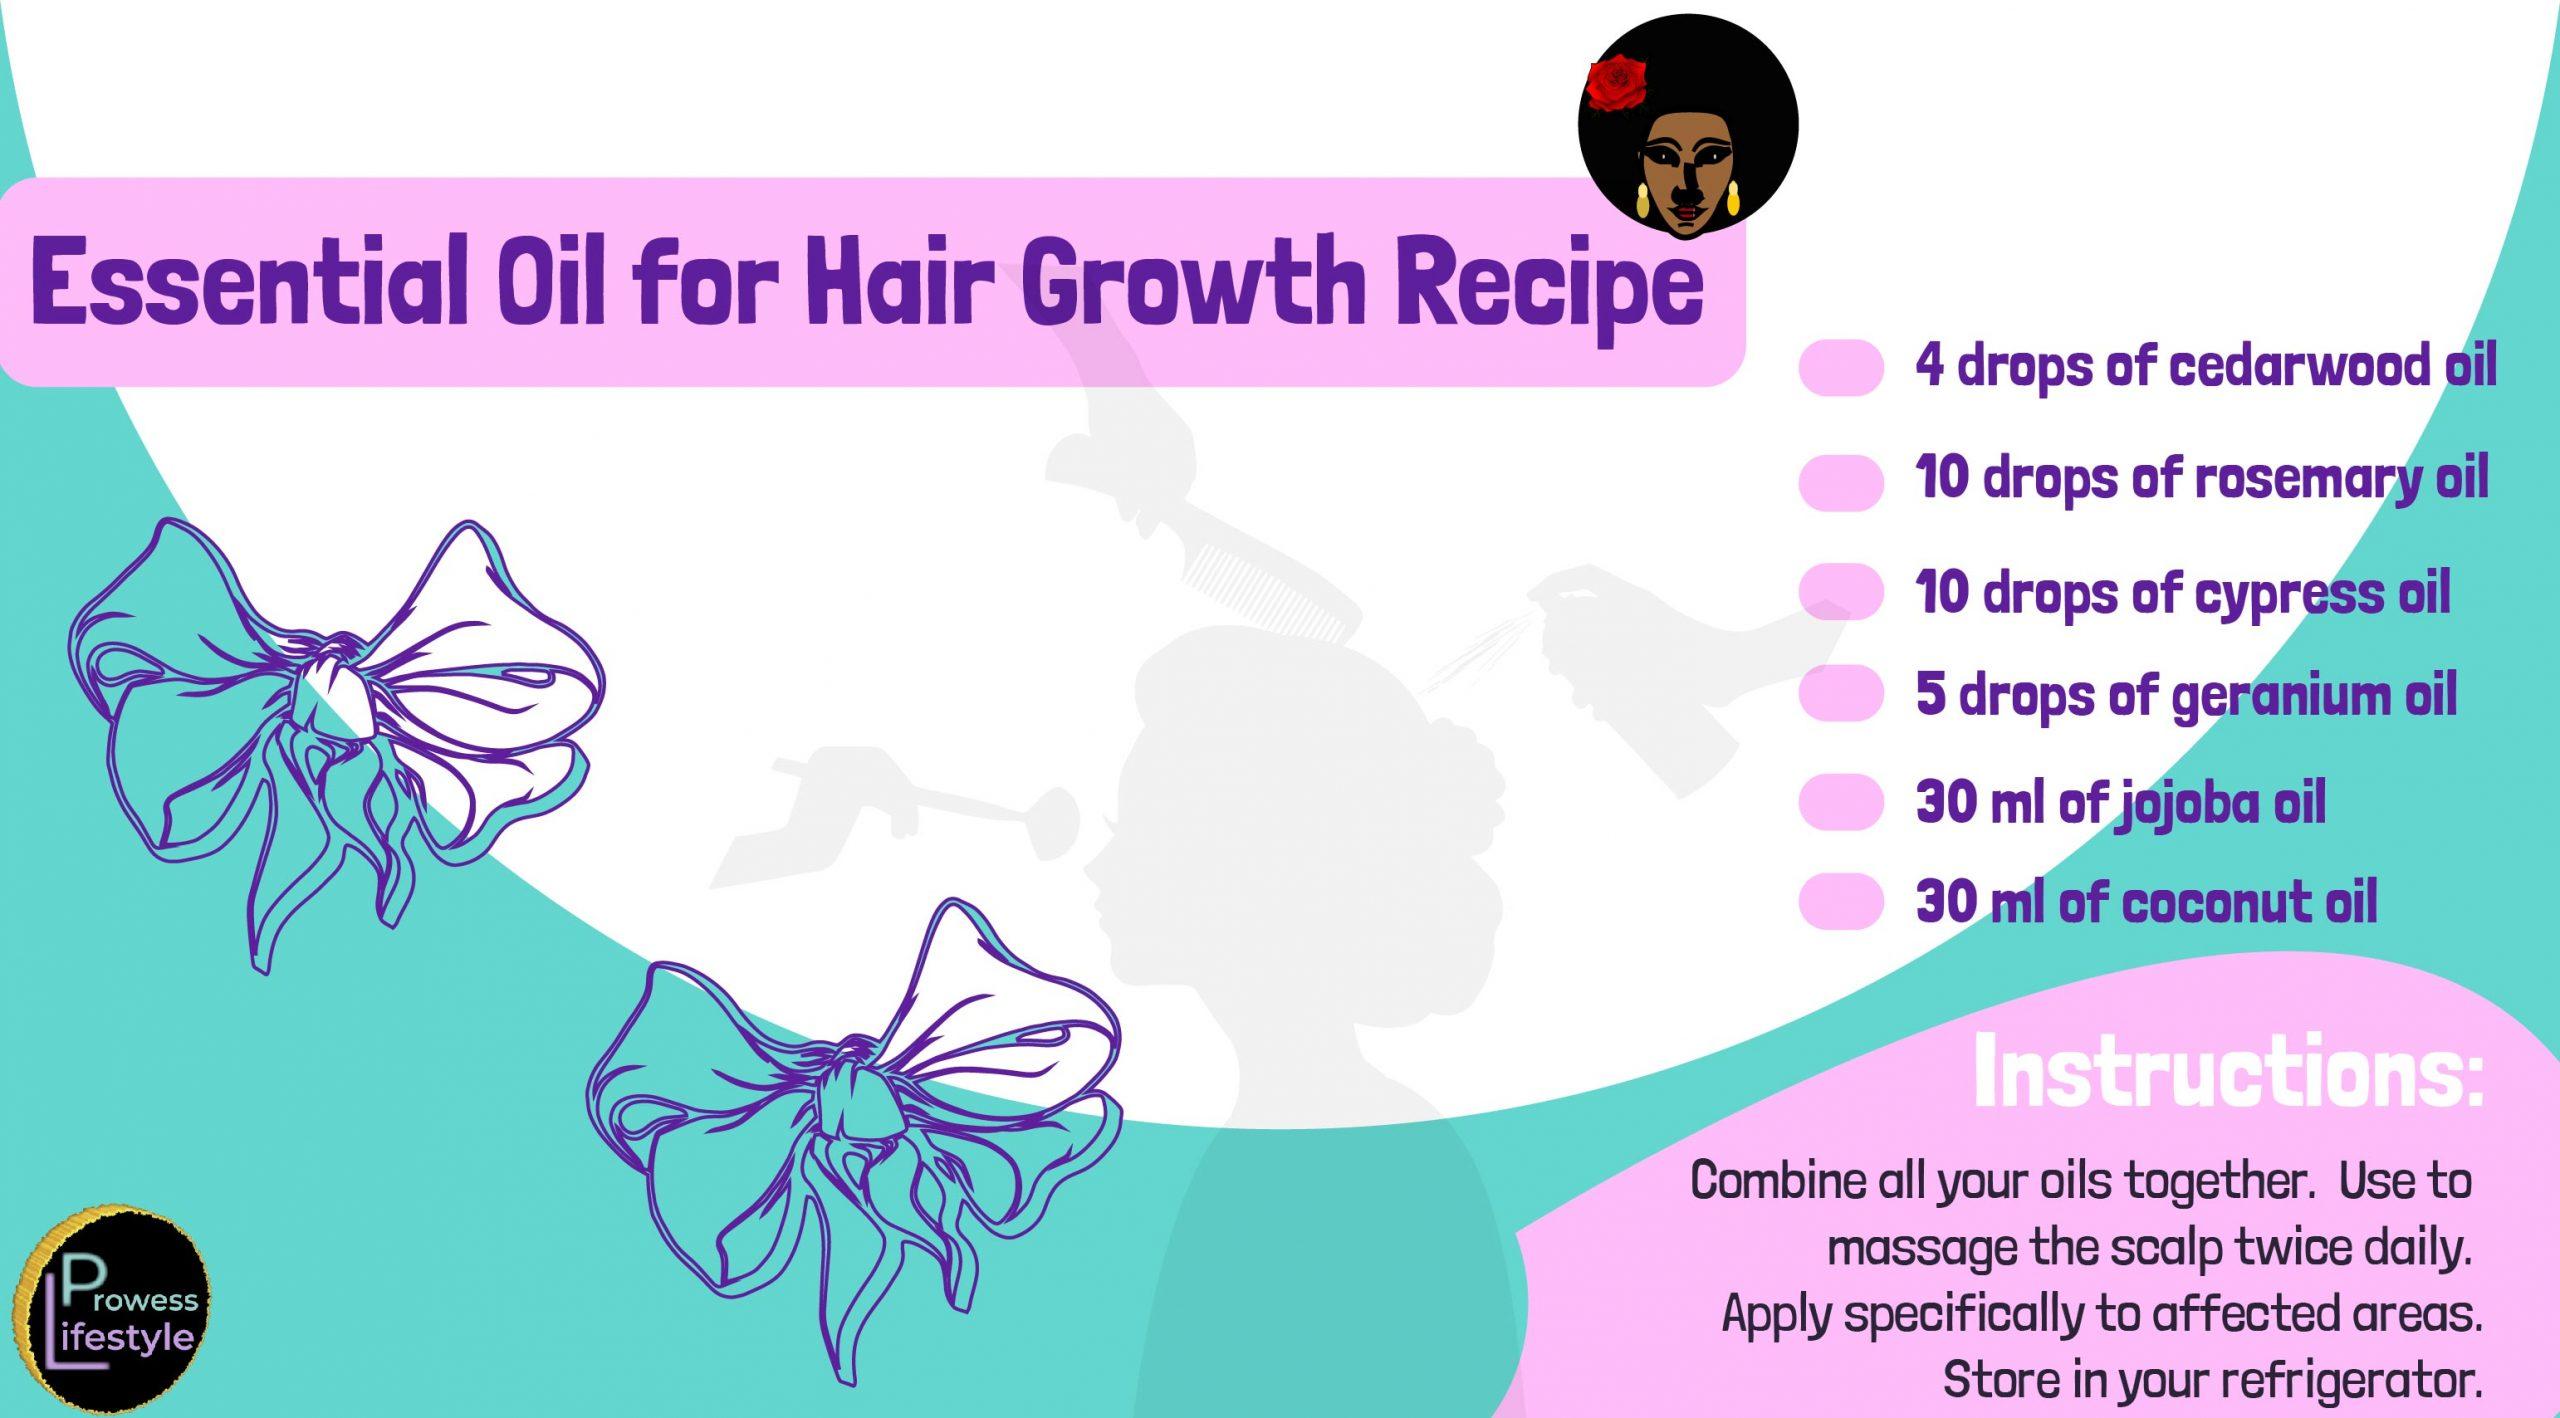 Geranium and cypress essential oils hair growth recipe